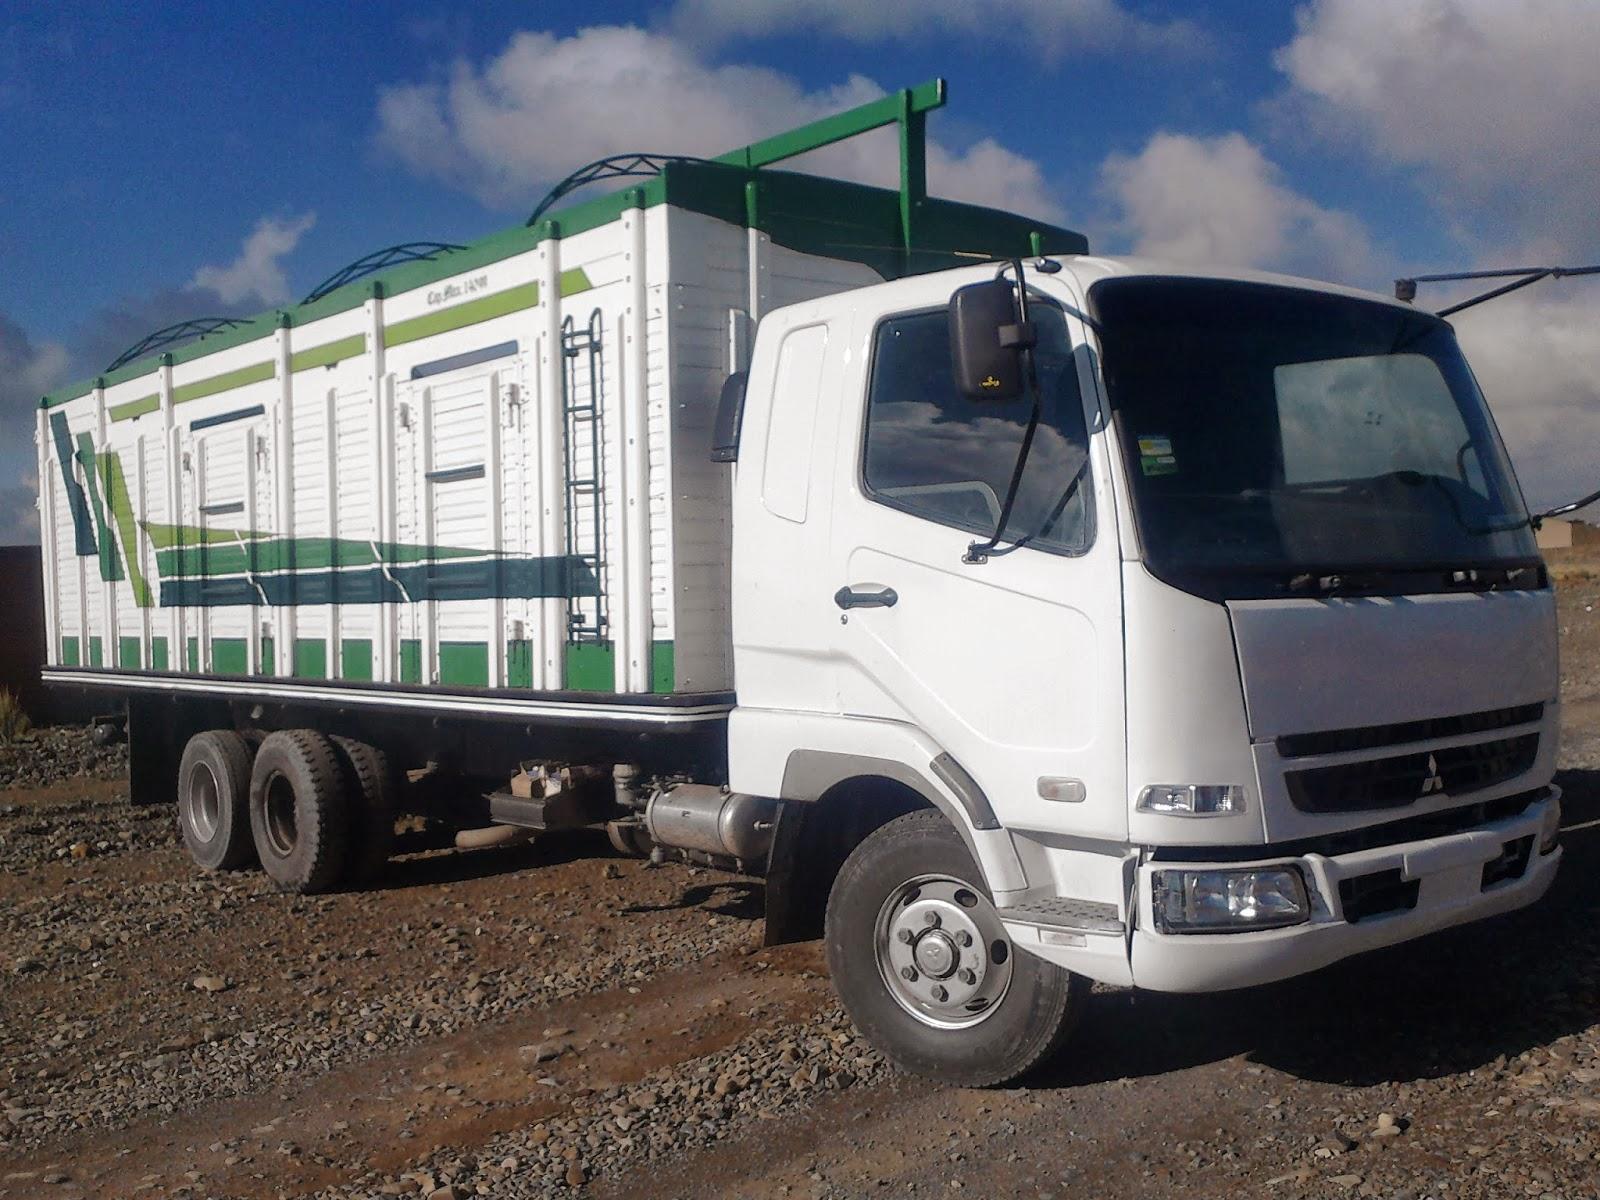 venta camion nissan mitsubishi fuso turbo intercooler camiones nissan condor 2008 turbo. Black Bedroom Furniture Sets. Home Design Ideas